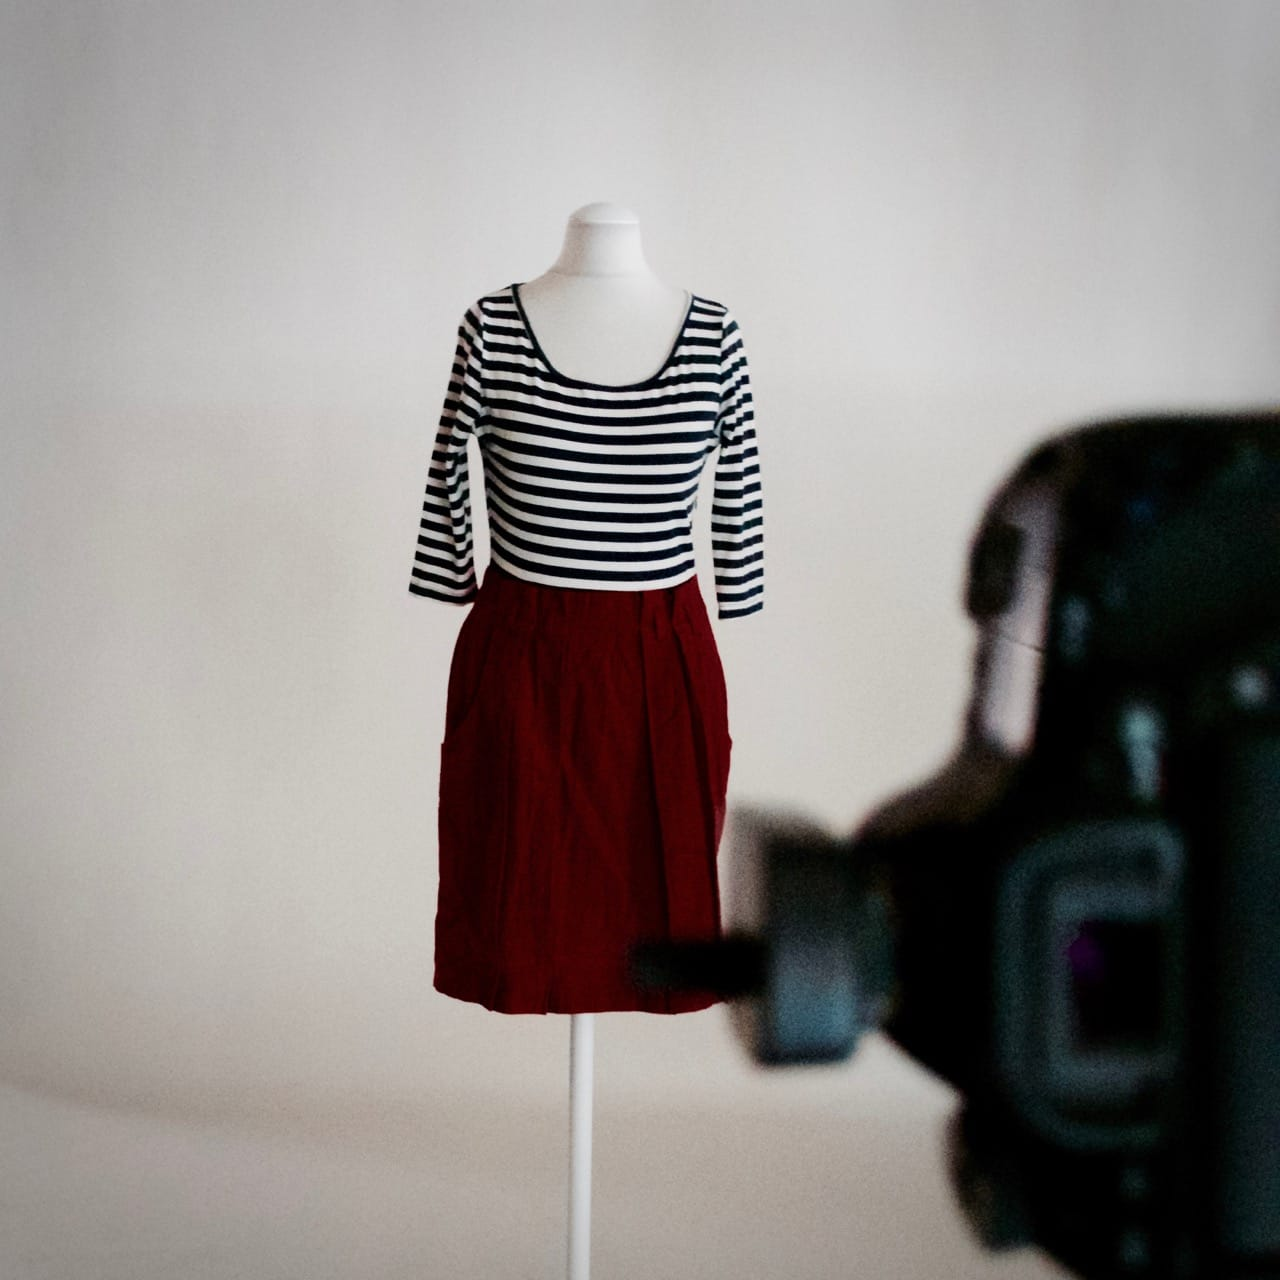 DASISTmomox fashion - Folge mir durch unser Lager 10